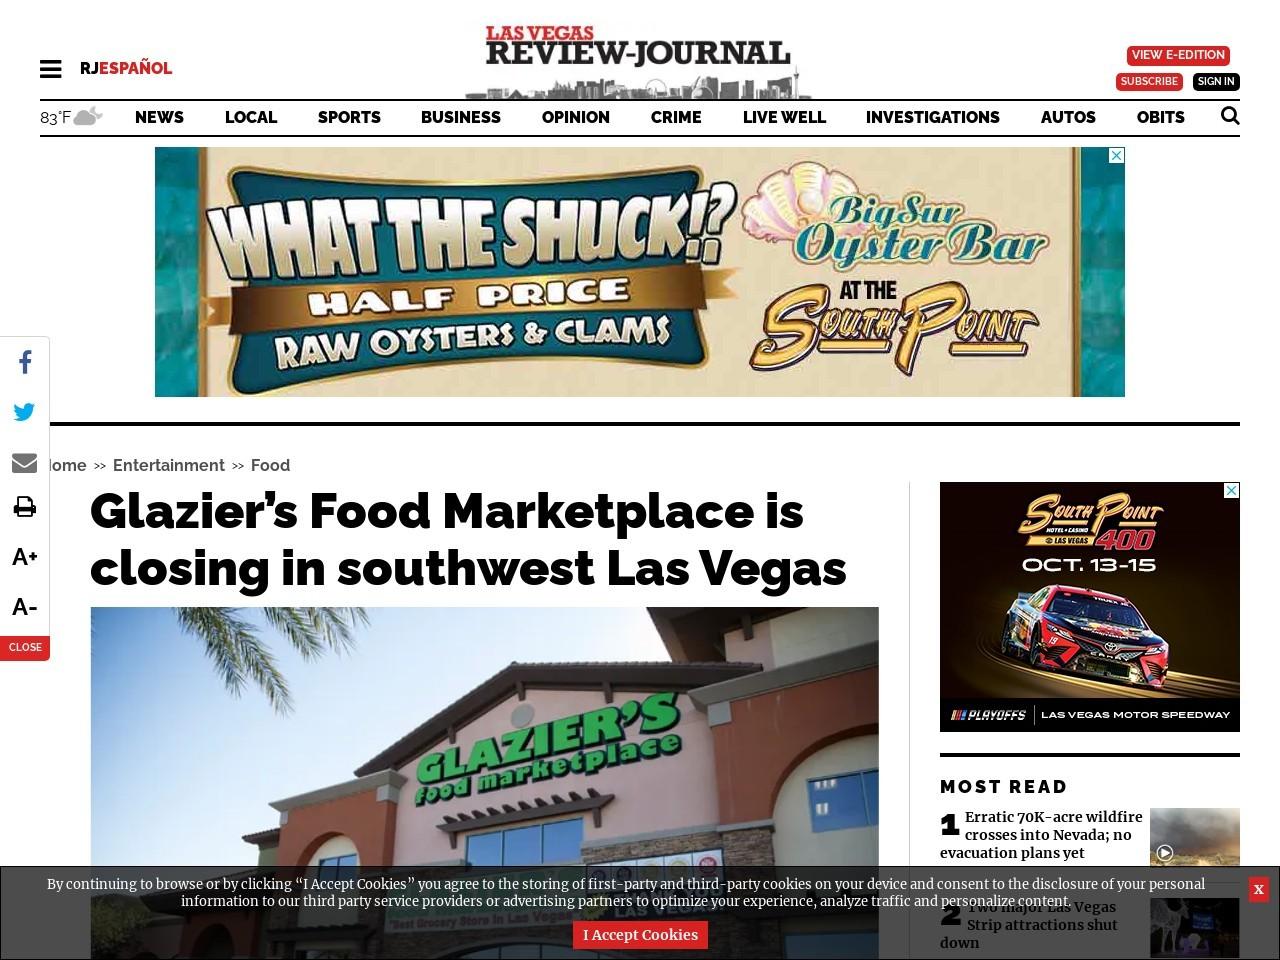 Glazier's Food Marketplace is closing in southwest Las Vegas